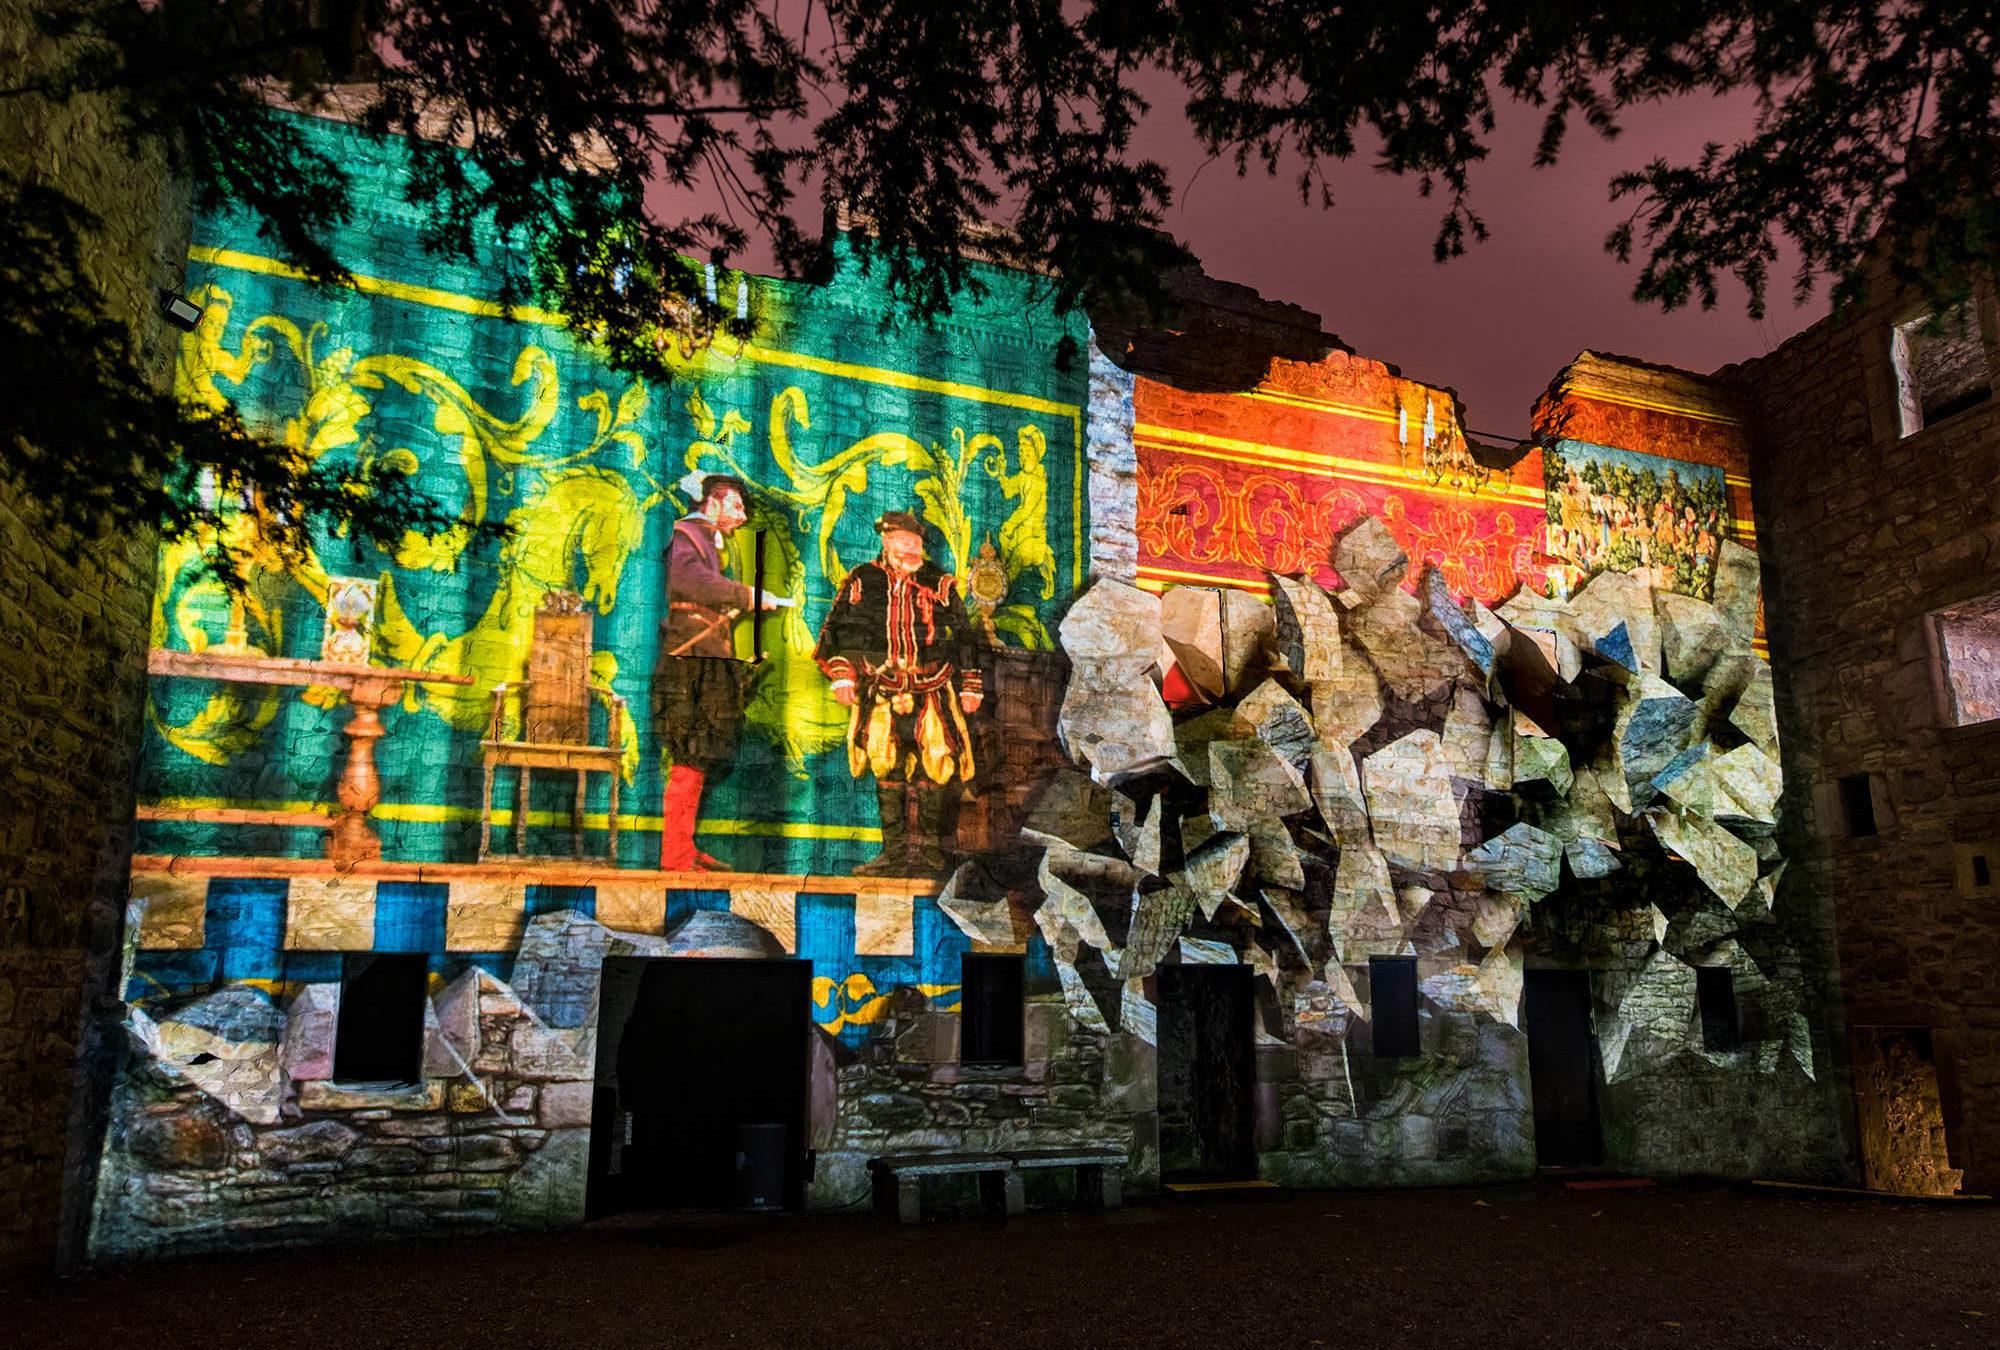 Spotlight on Mary, Projection Light Walk, in Craigmillar courtyard